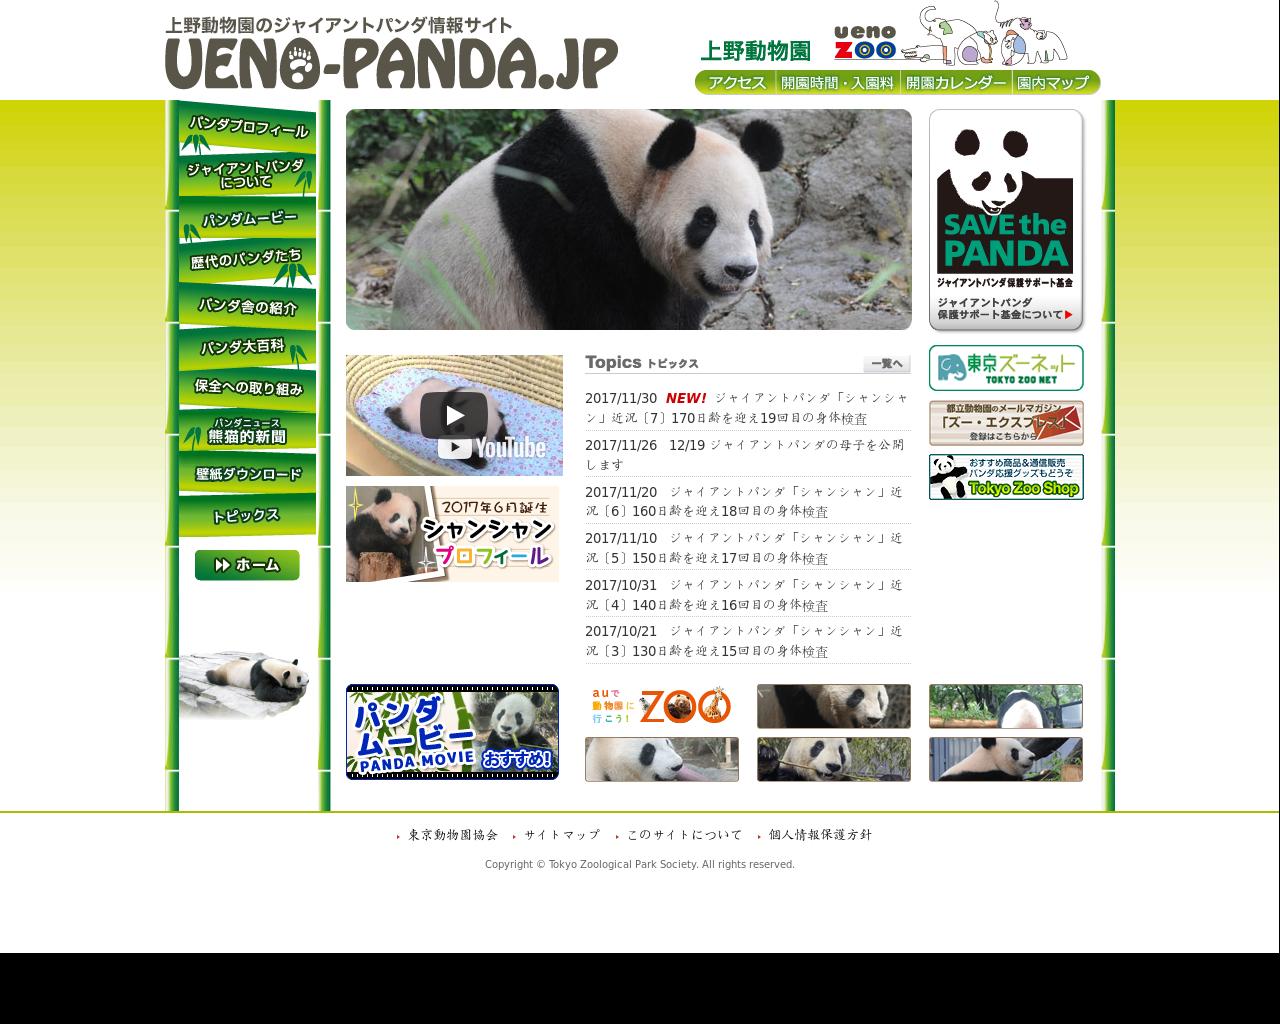 www.ueno-panda.jp(2017/12/07 02:06:25)